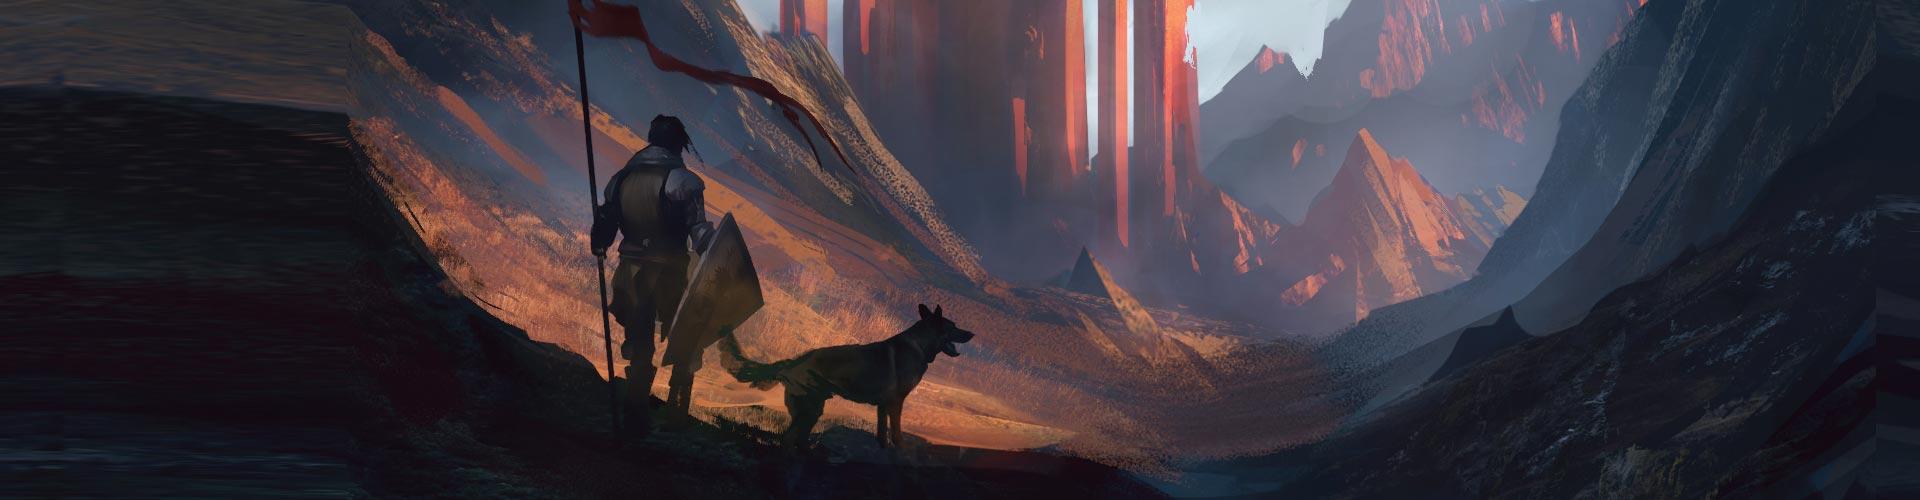 Digital painting 10